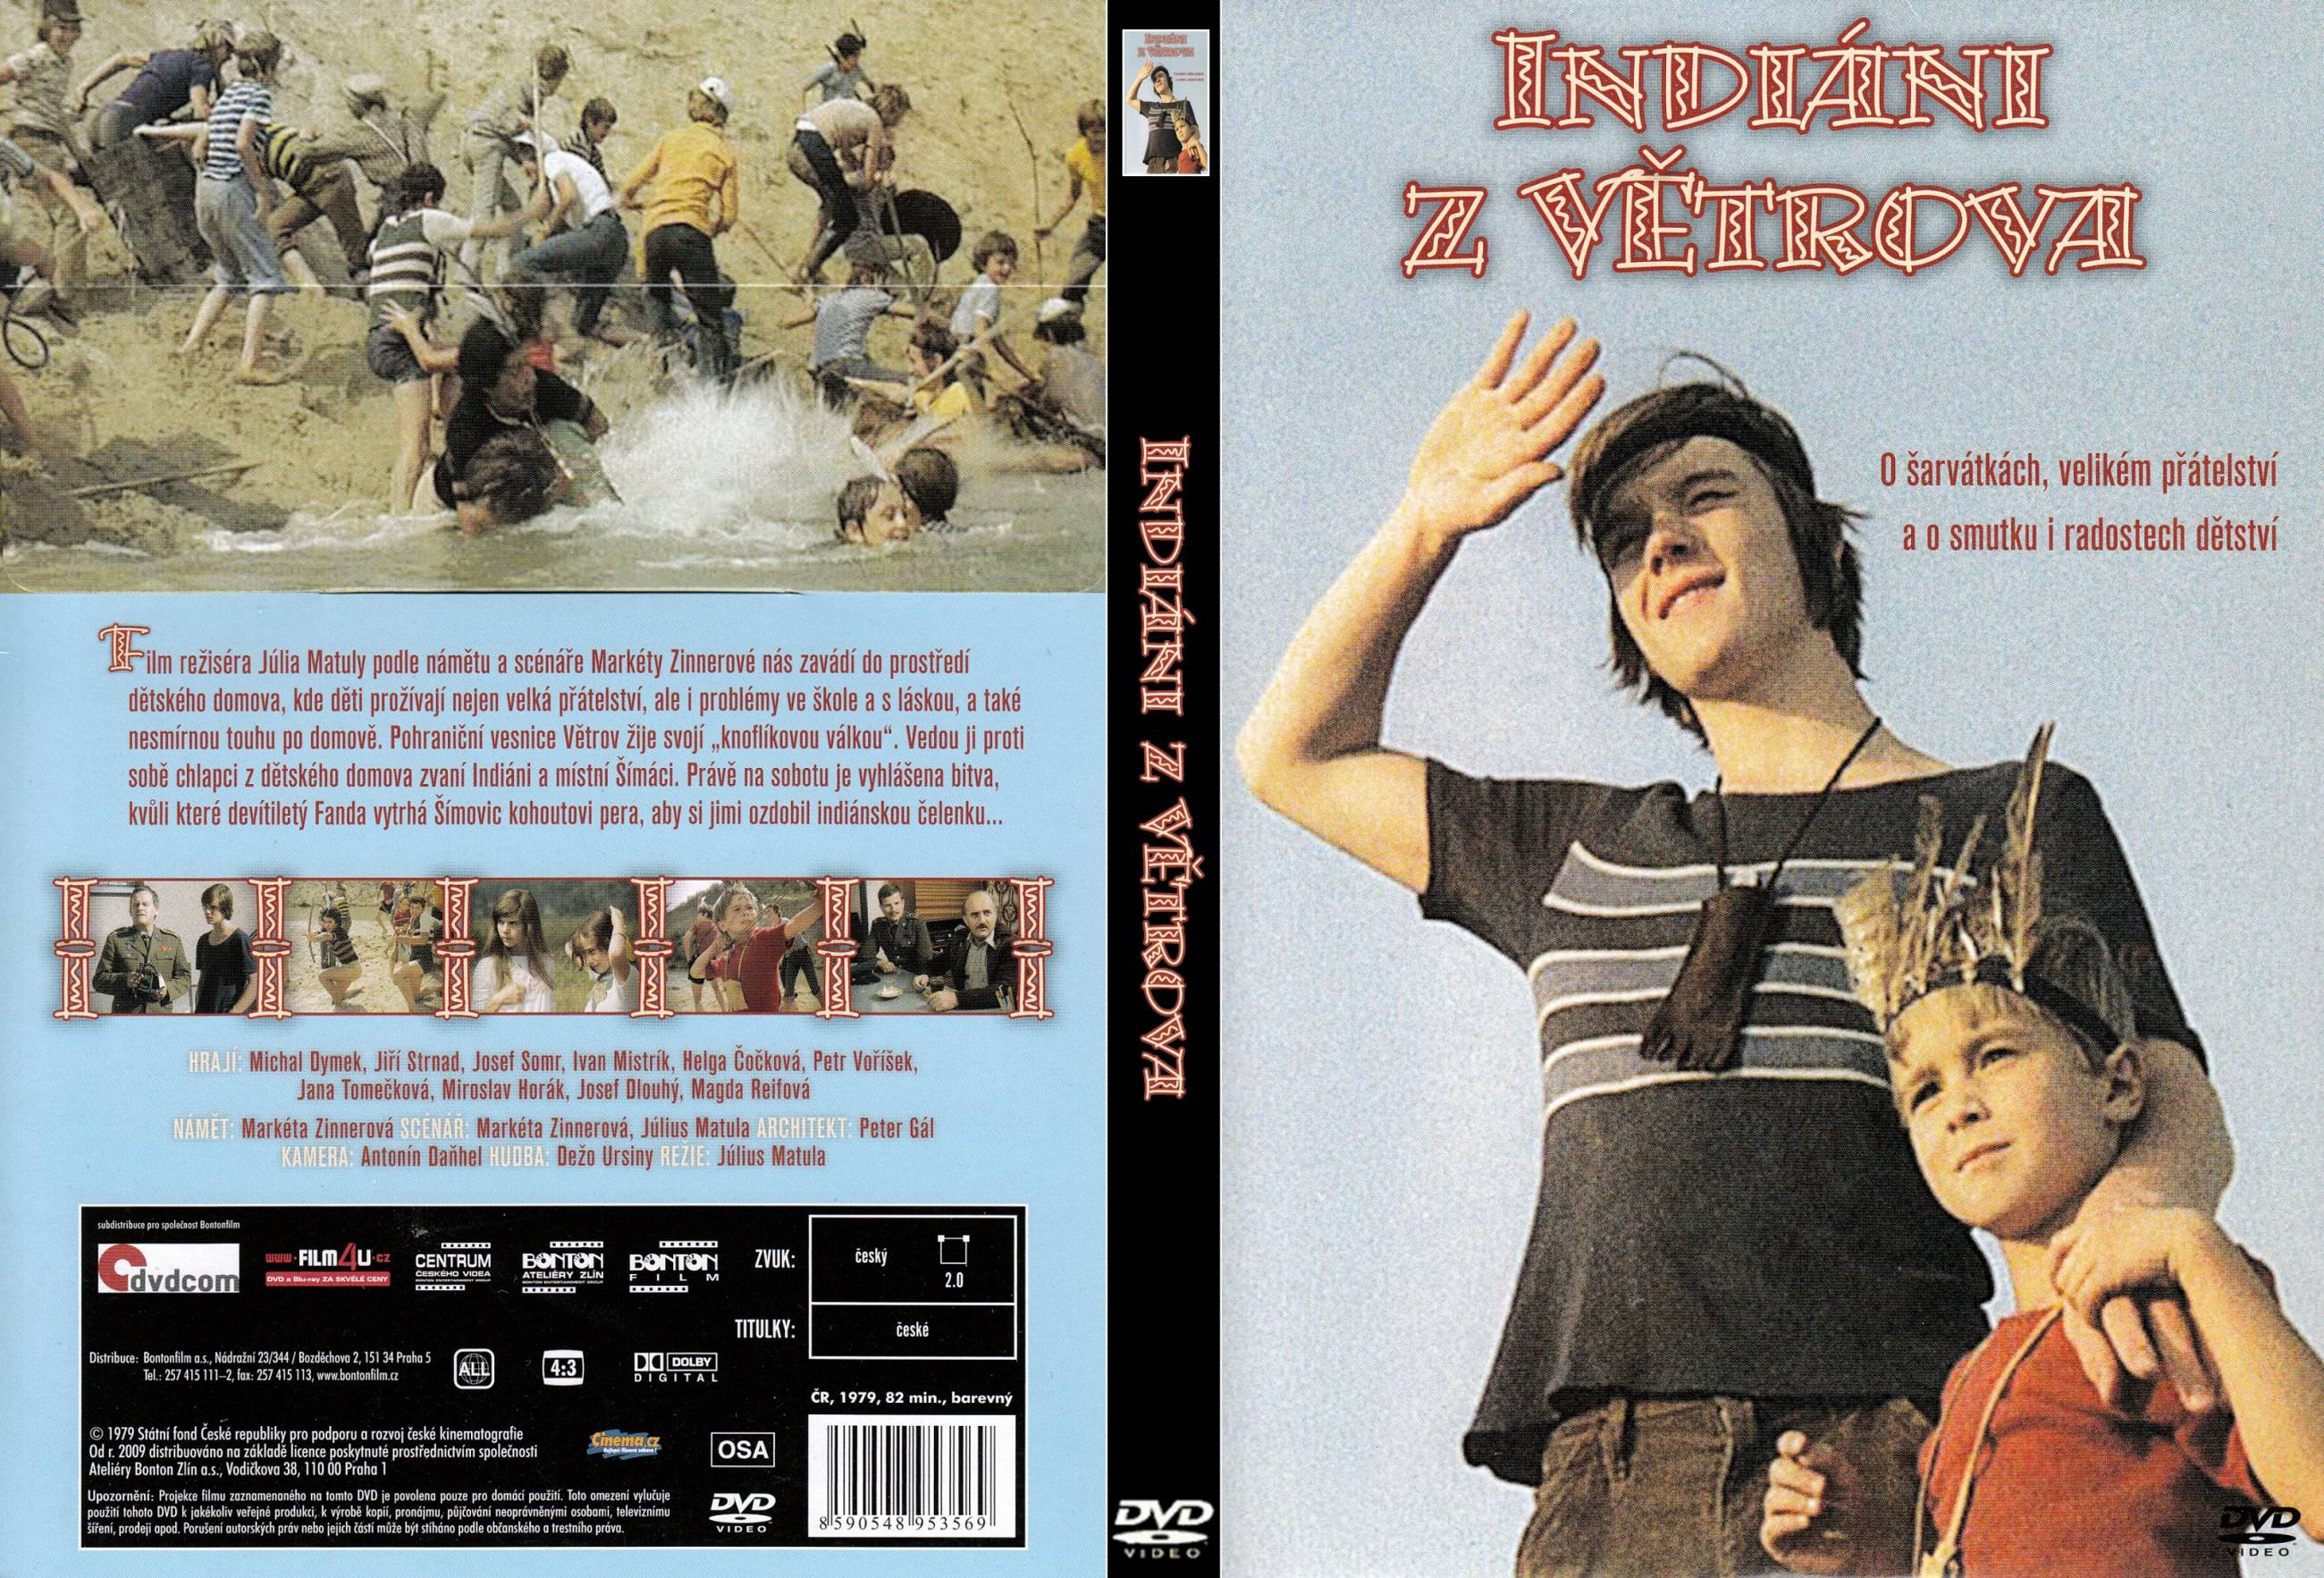 http://covers.box3.net/newsimg/dvdmov/max1344279122-front-cover.jpg